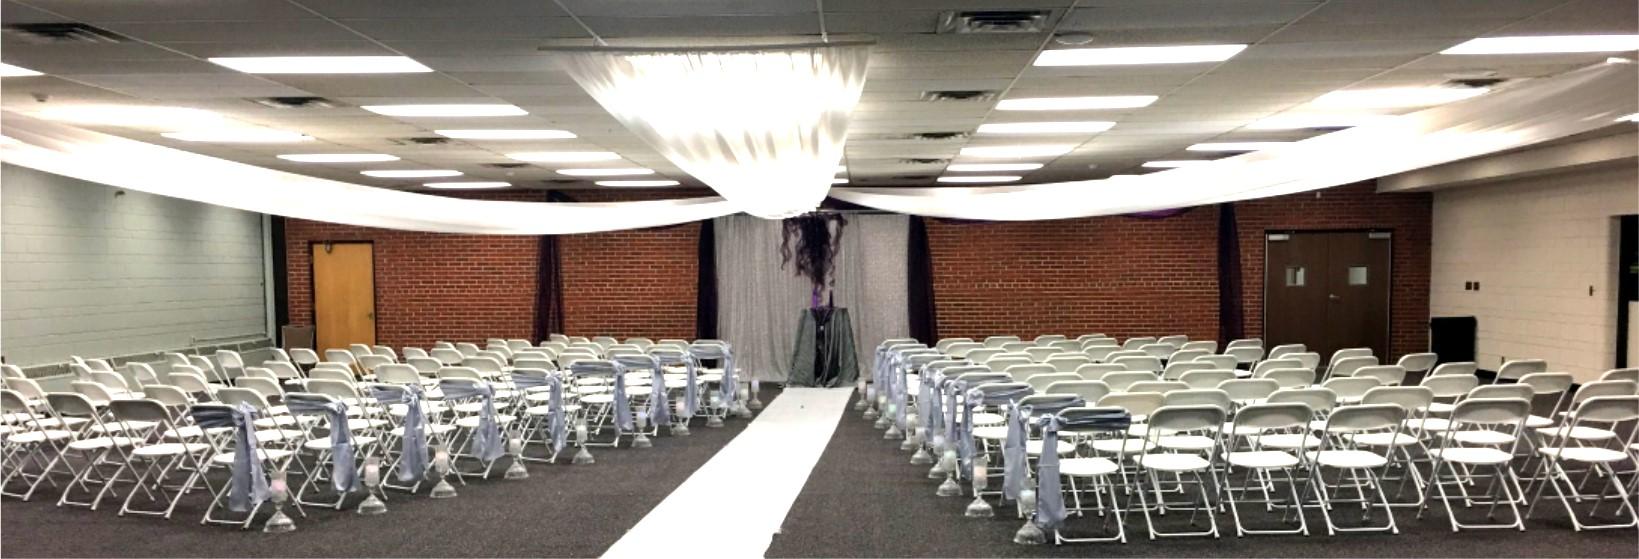 LTC Central Room 1